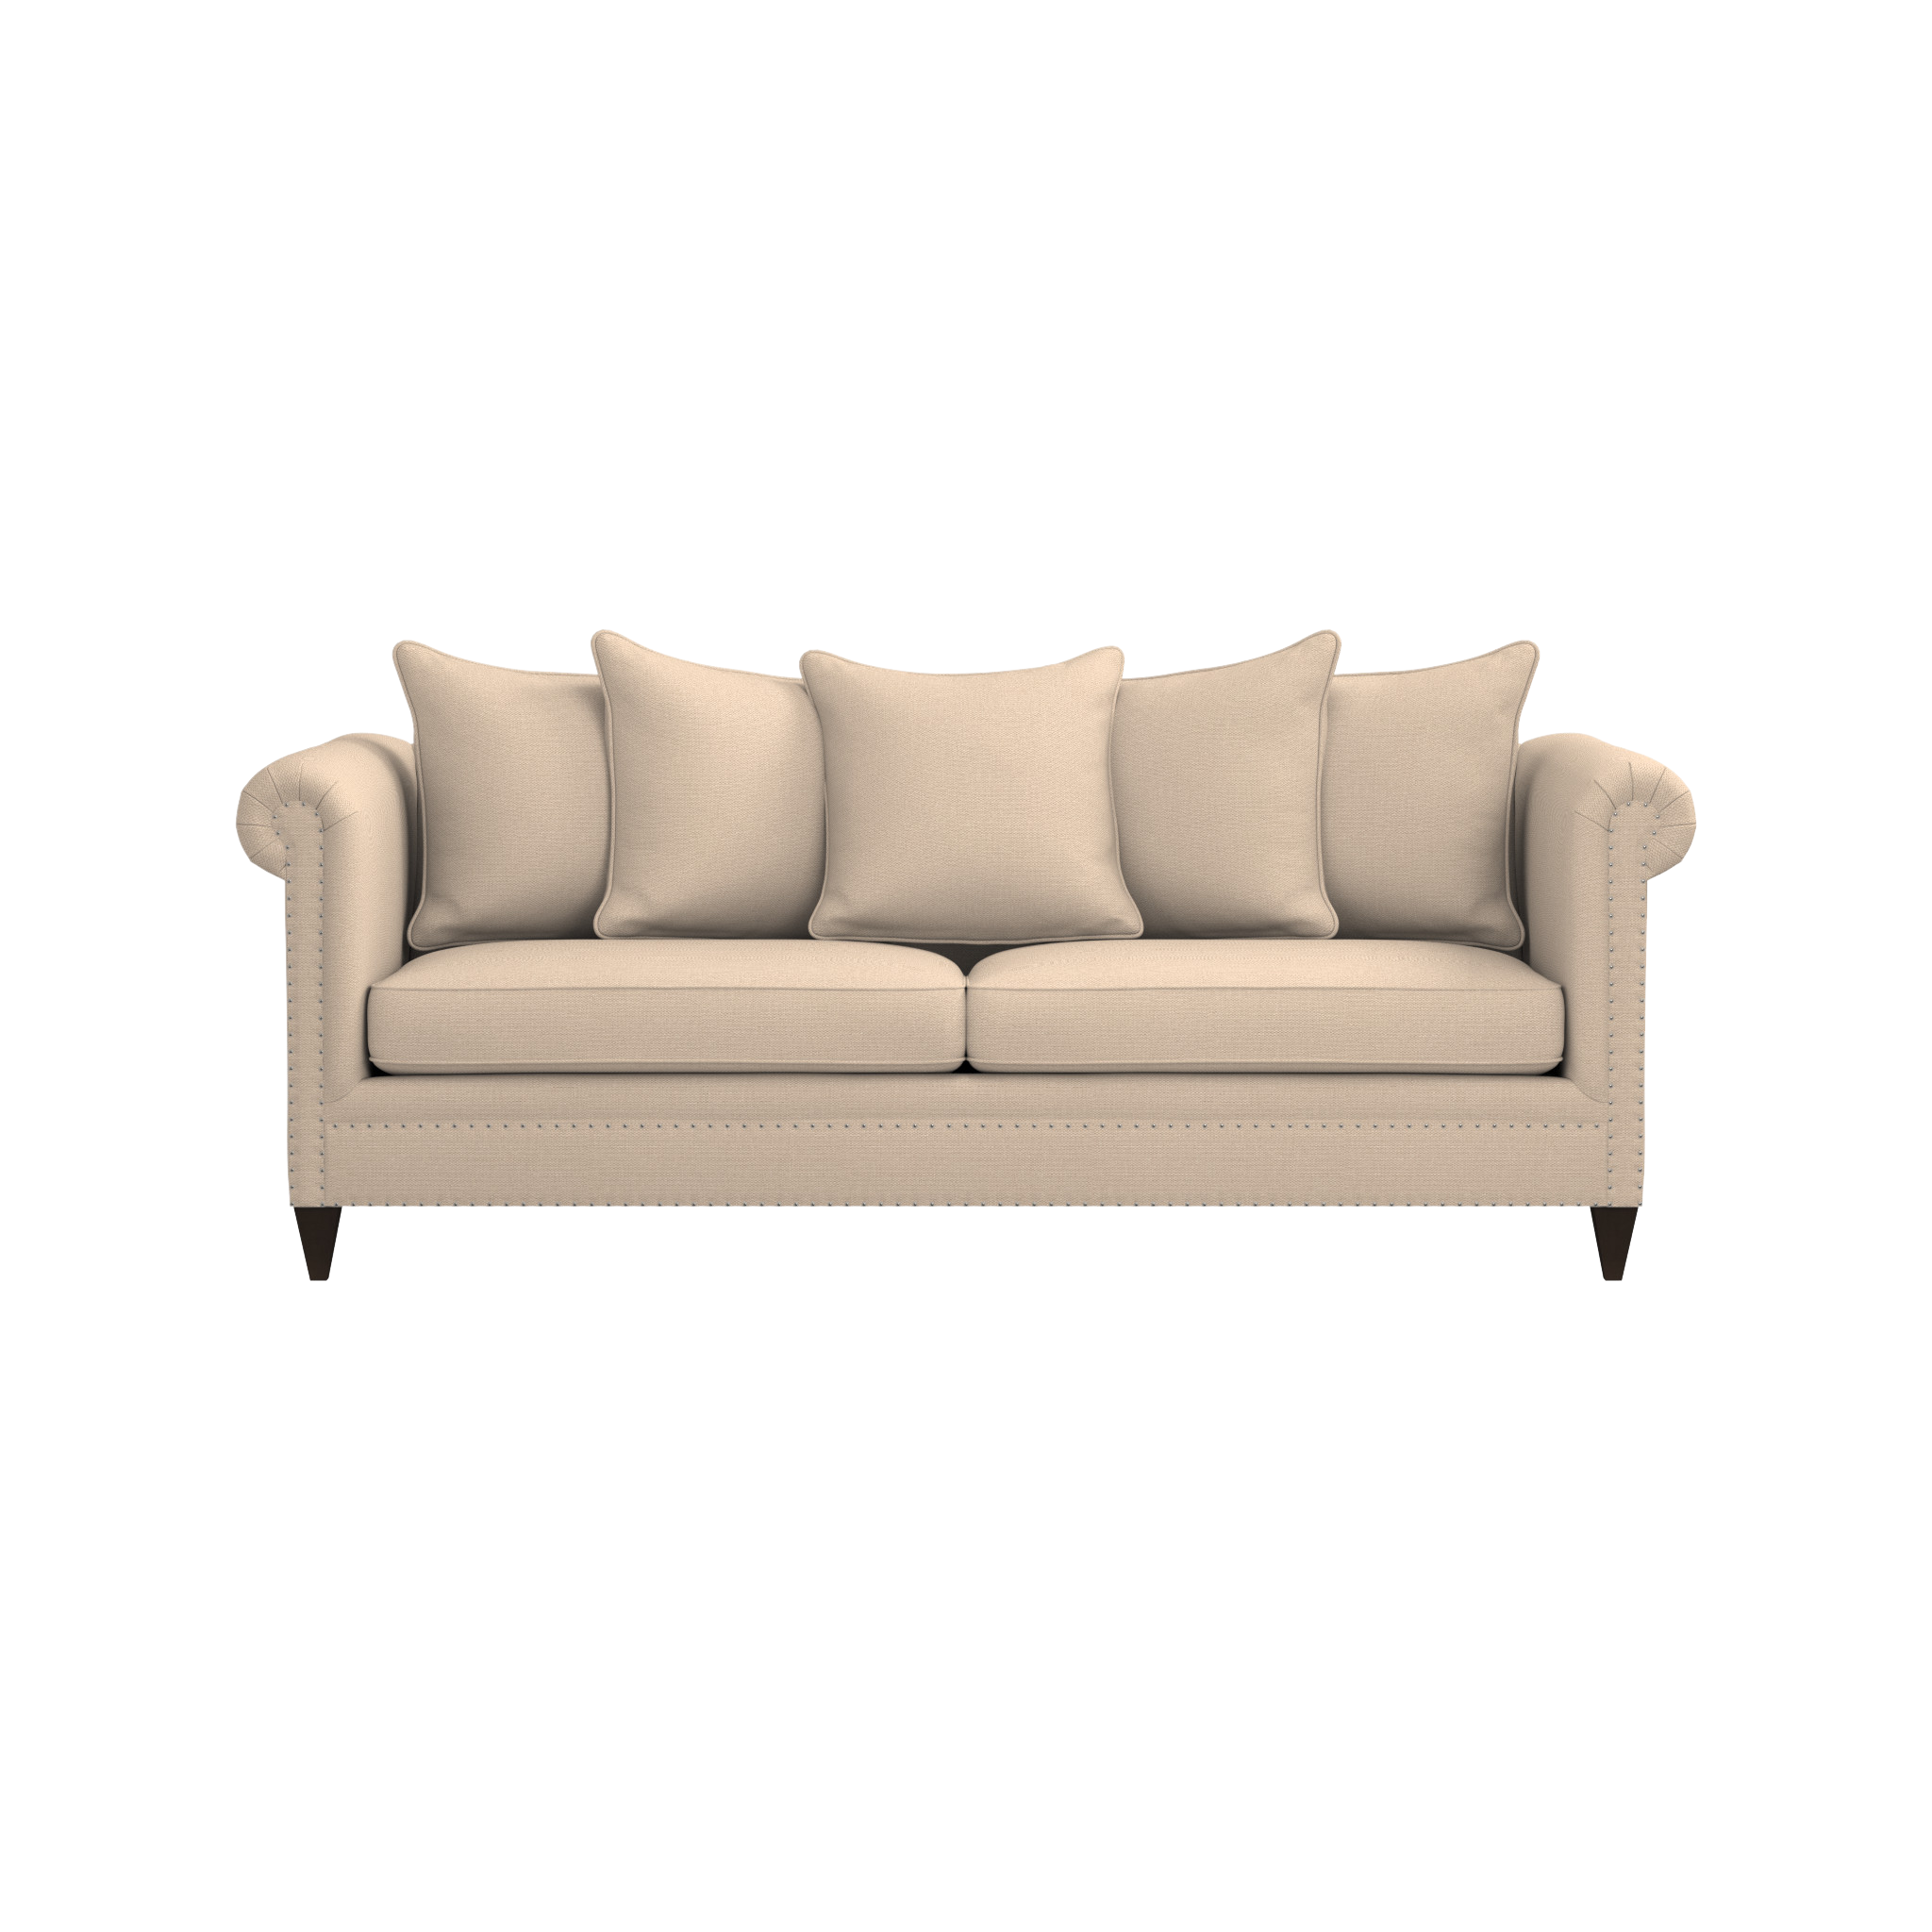 Mayo Furniture 3180F Fabric Sofa fort Sand